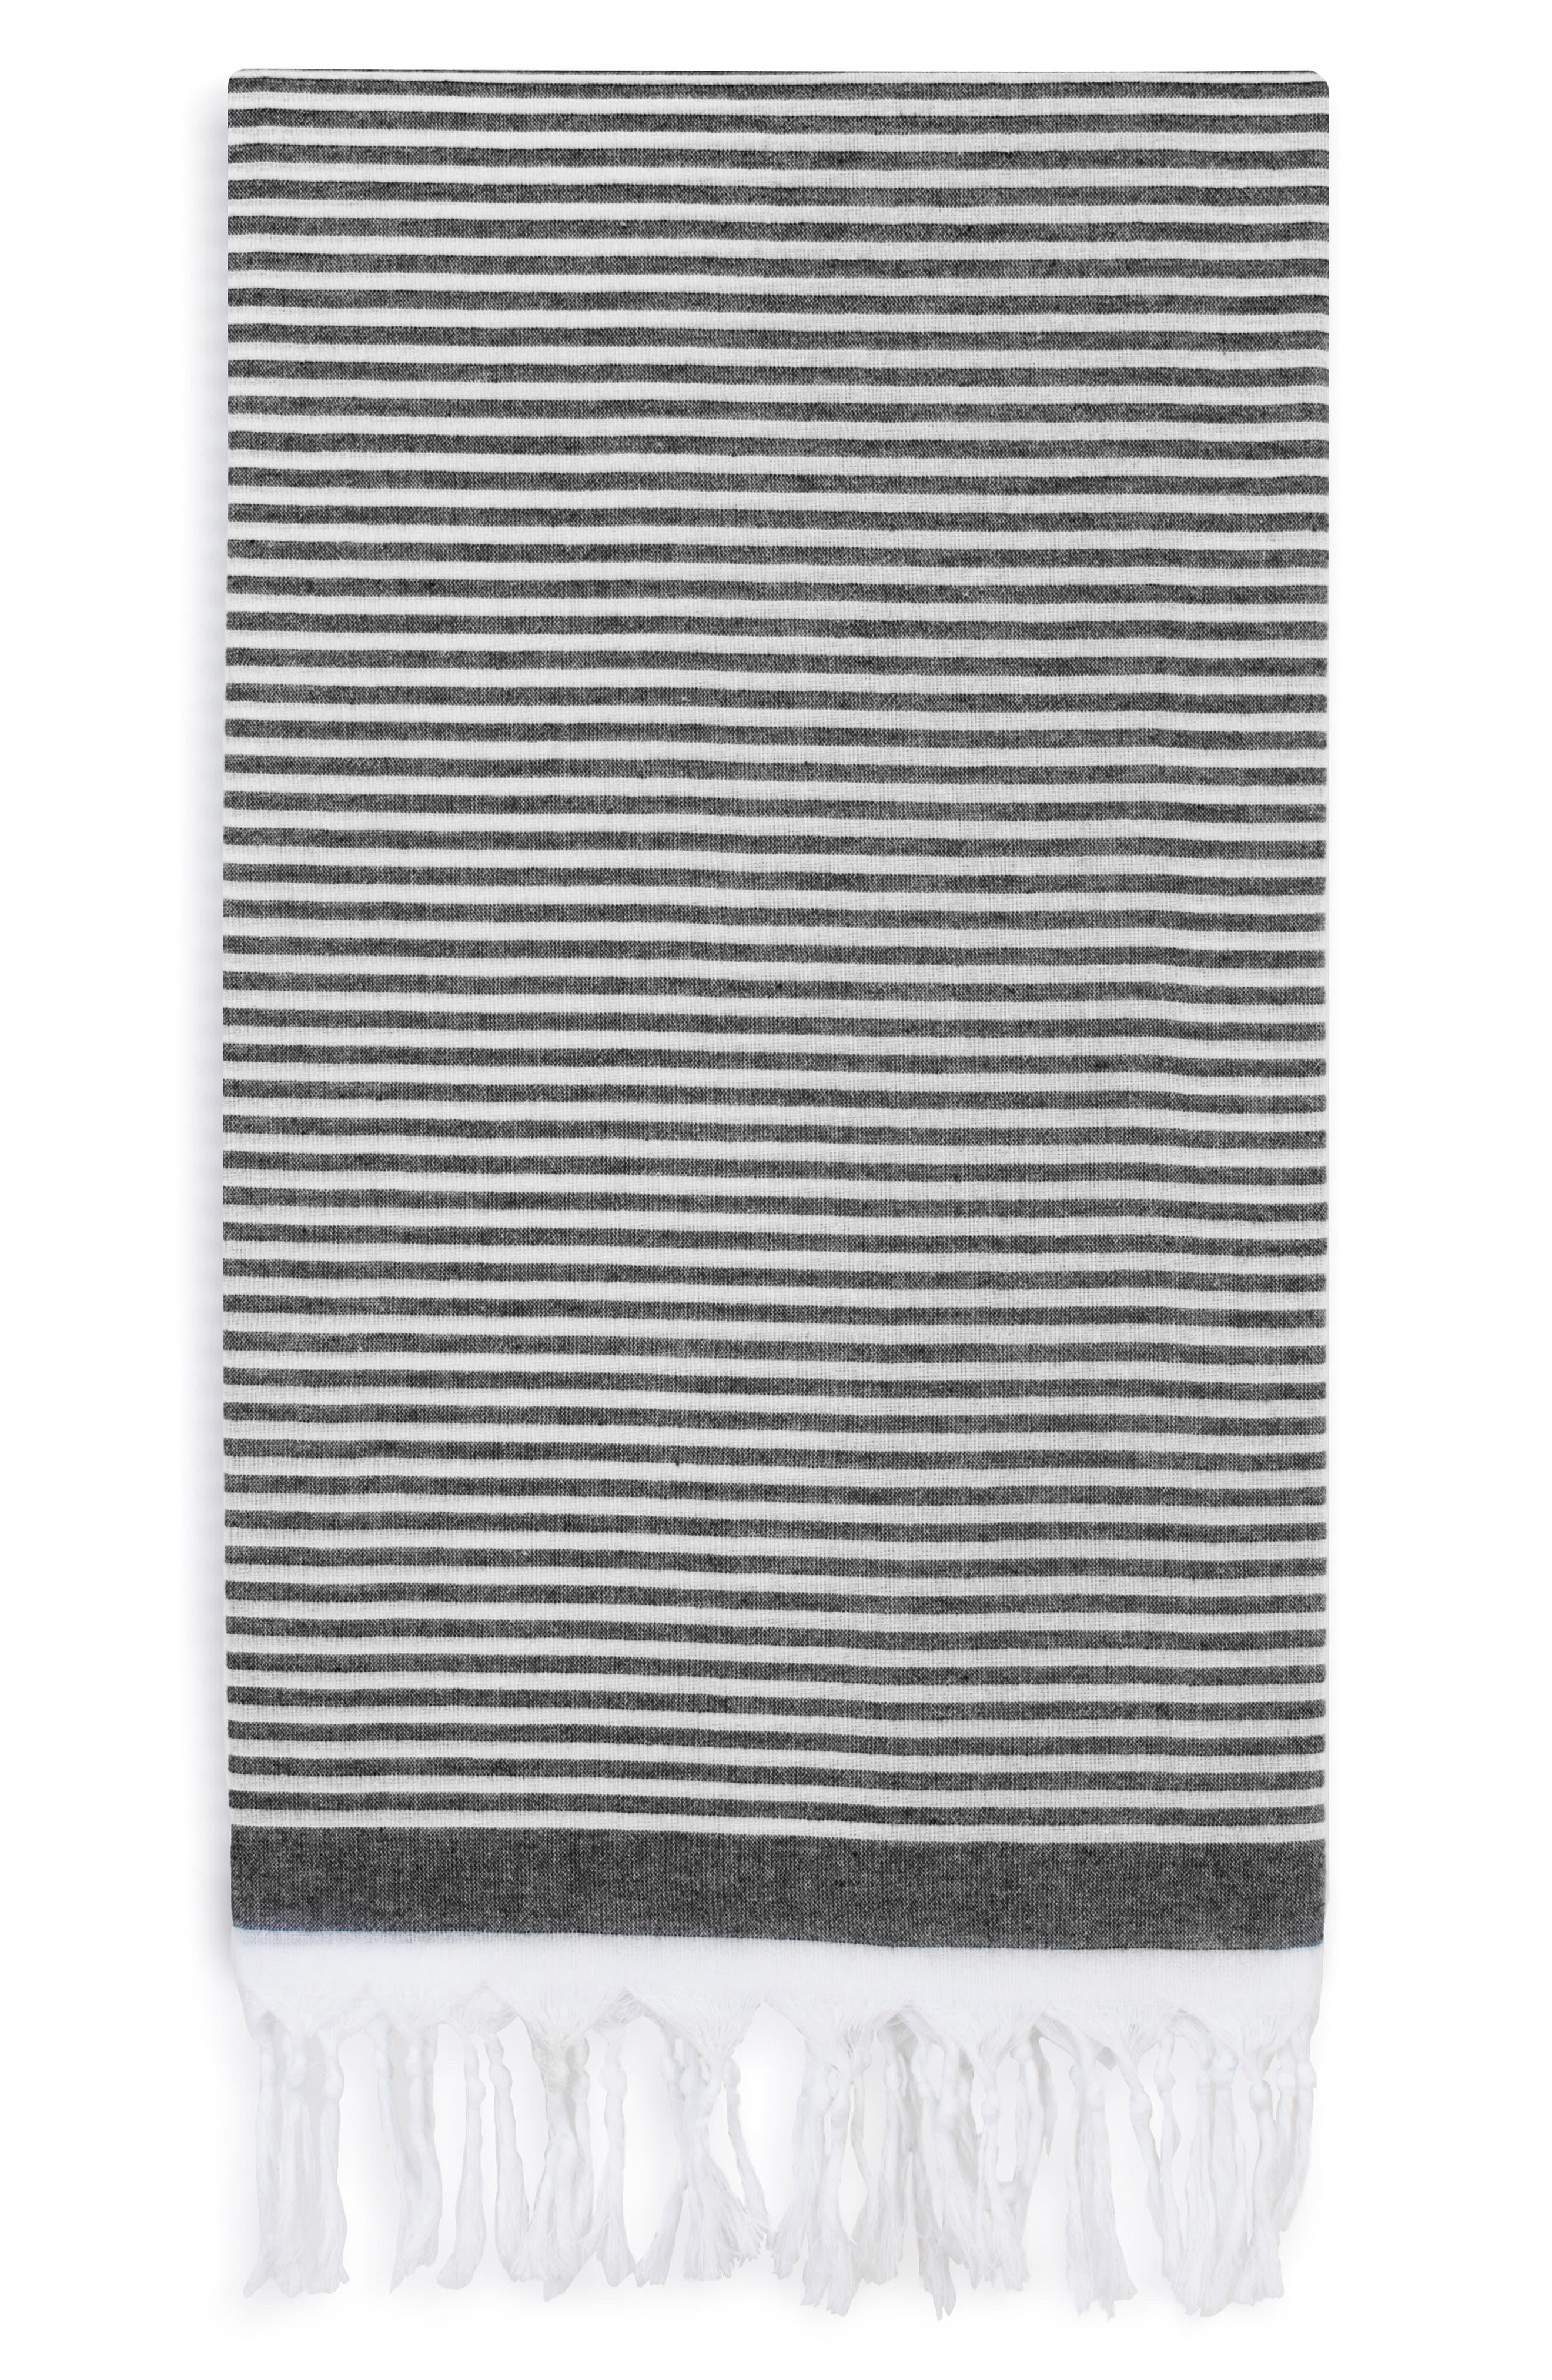 Soft Stripes Turkish Pestemal Towel,                             Main thumbnail 1, color,                             BLACK